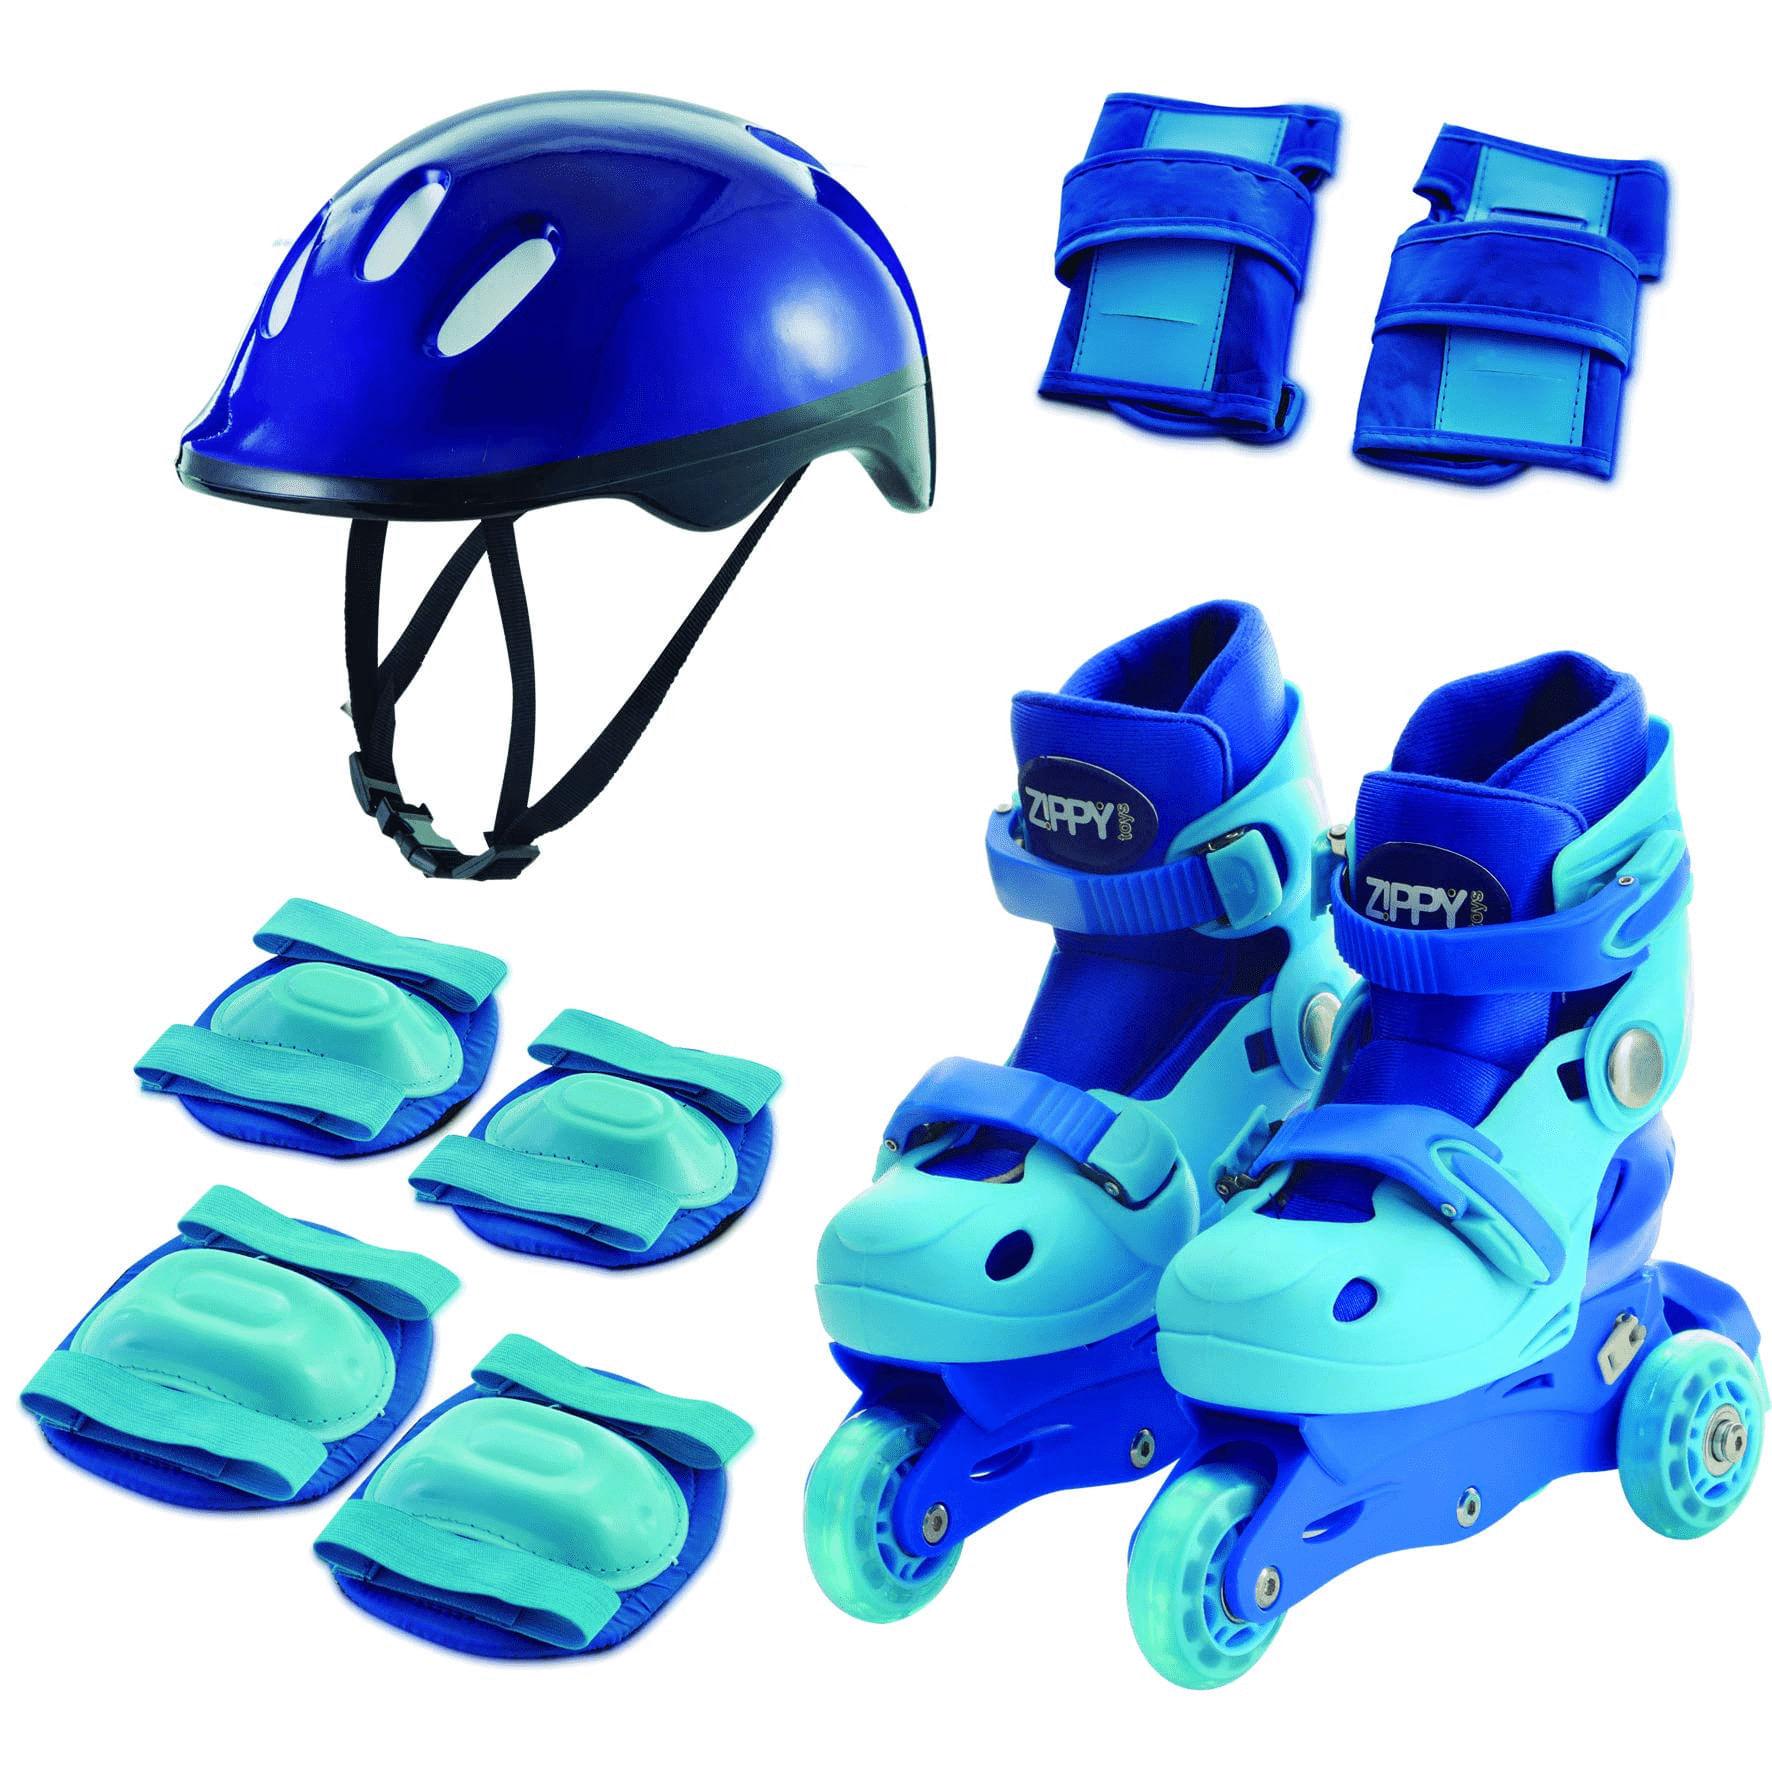 Kit Patins Tri Line - 2 em 1 - Azul - Zippy Mimo Style